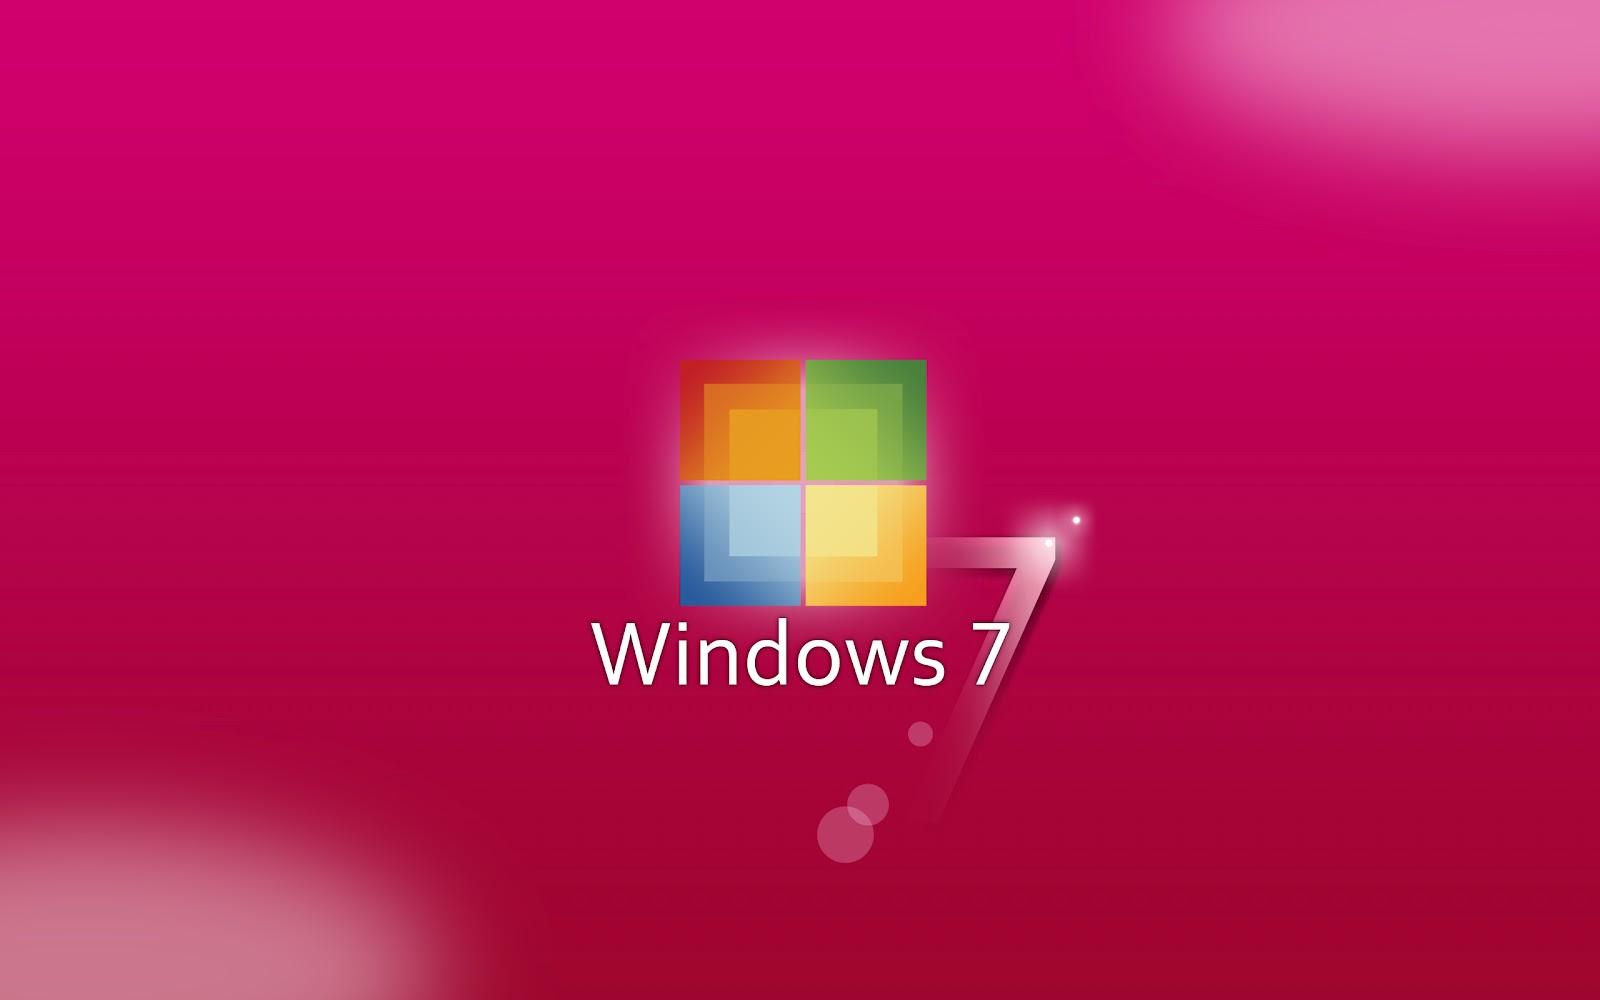 shared wallpaper windows - photo #23